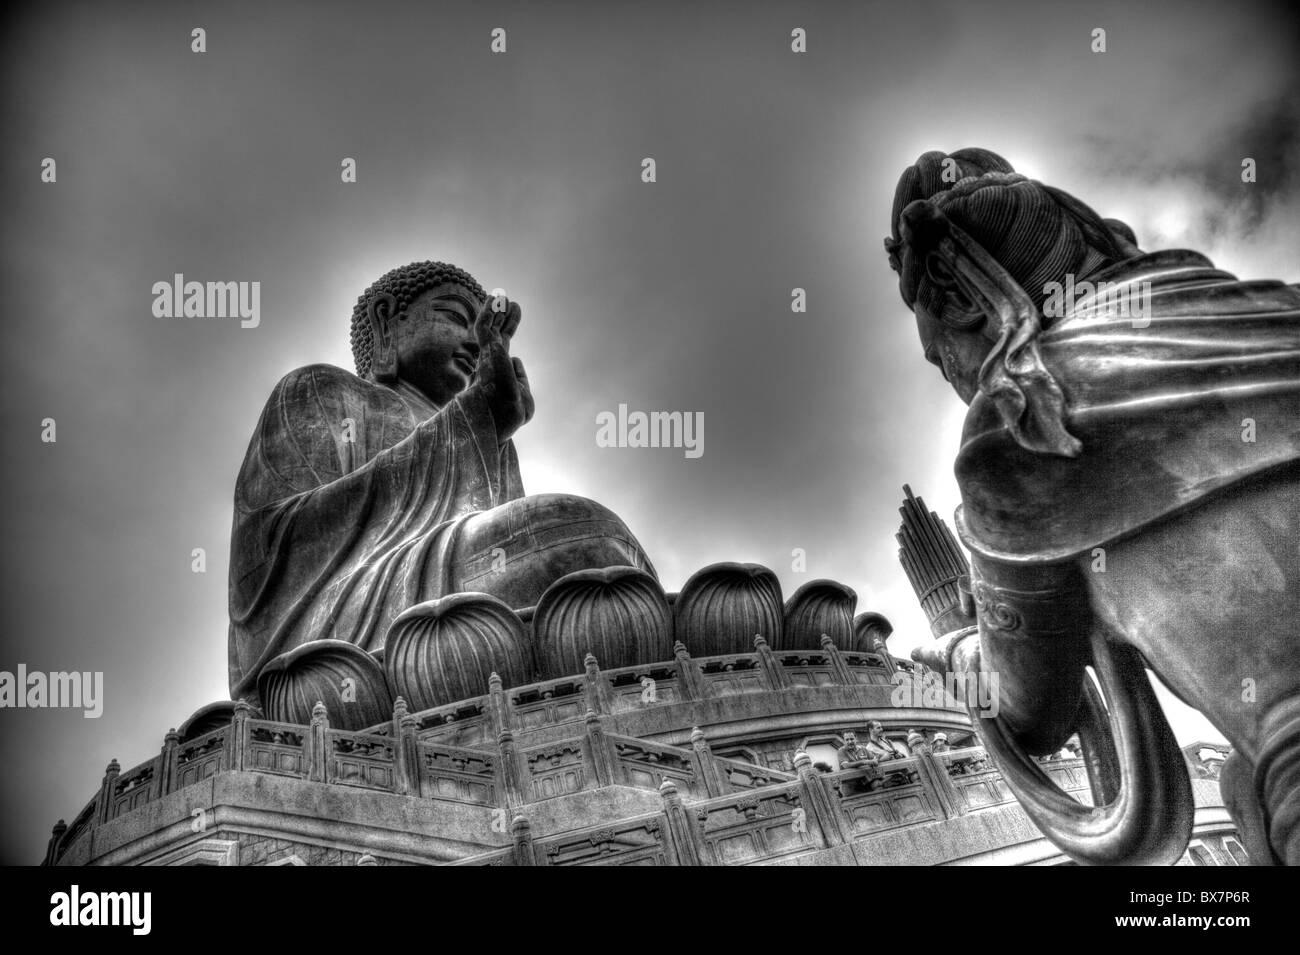 Hong Kong, Lantau island seated bronze statue Buddha, Lantau Buddha, Lantau Big Buddah, Lantau island, Lantau bronze - Stock Image